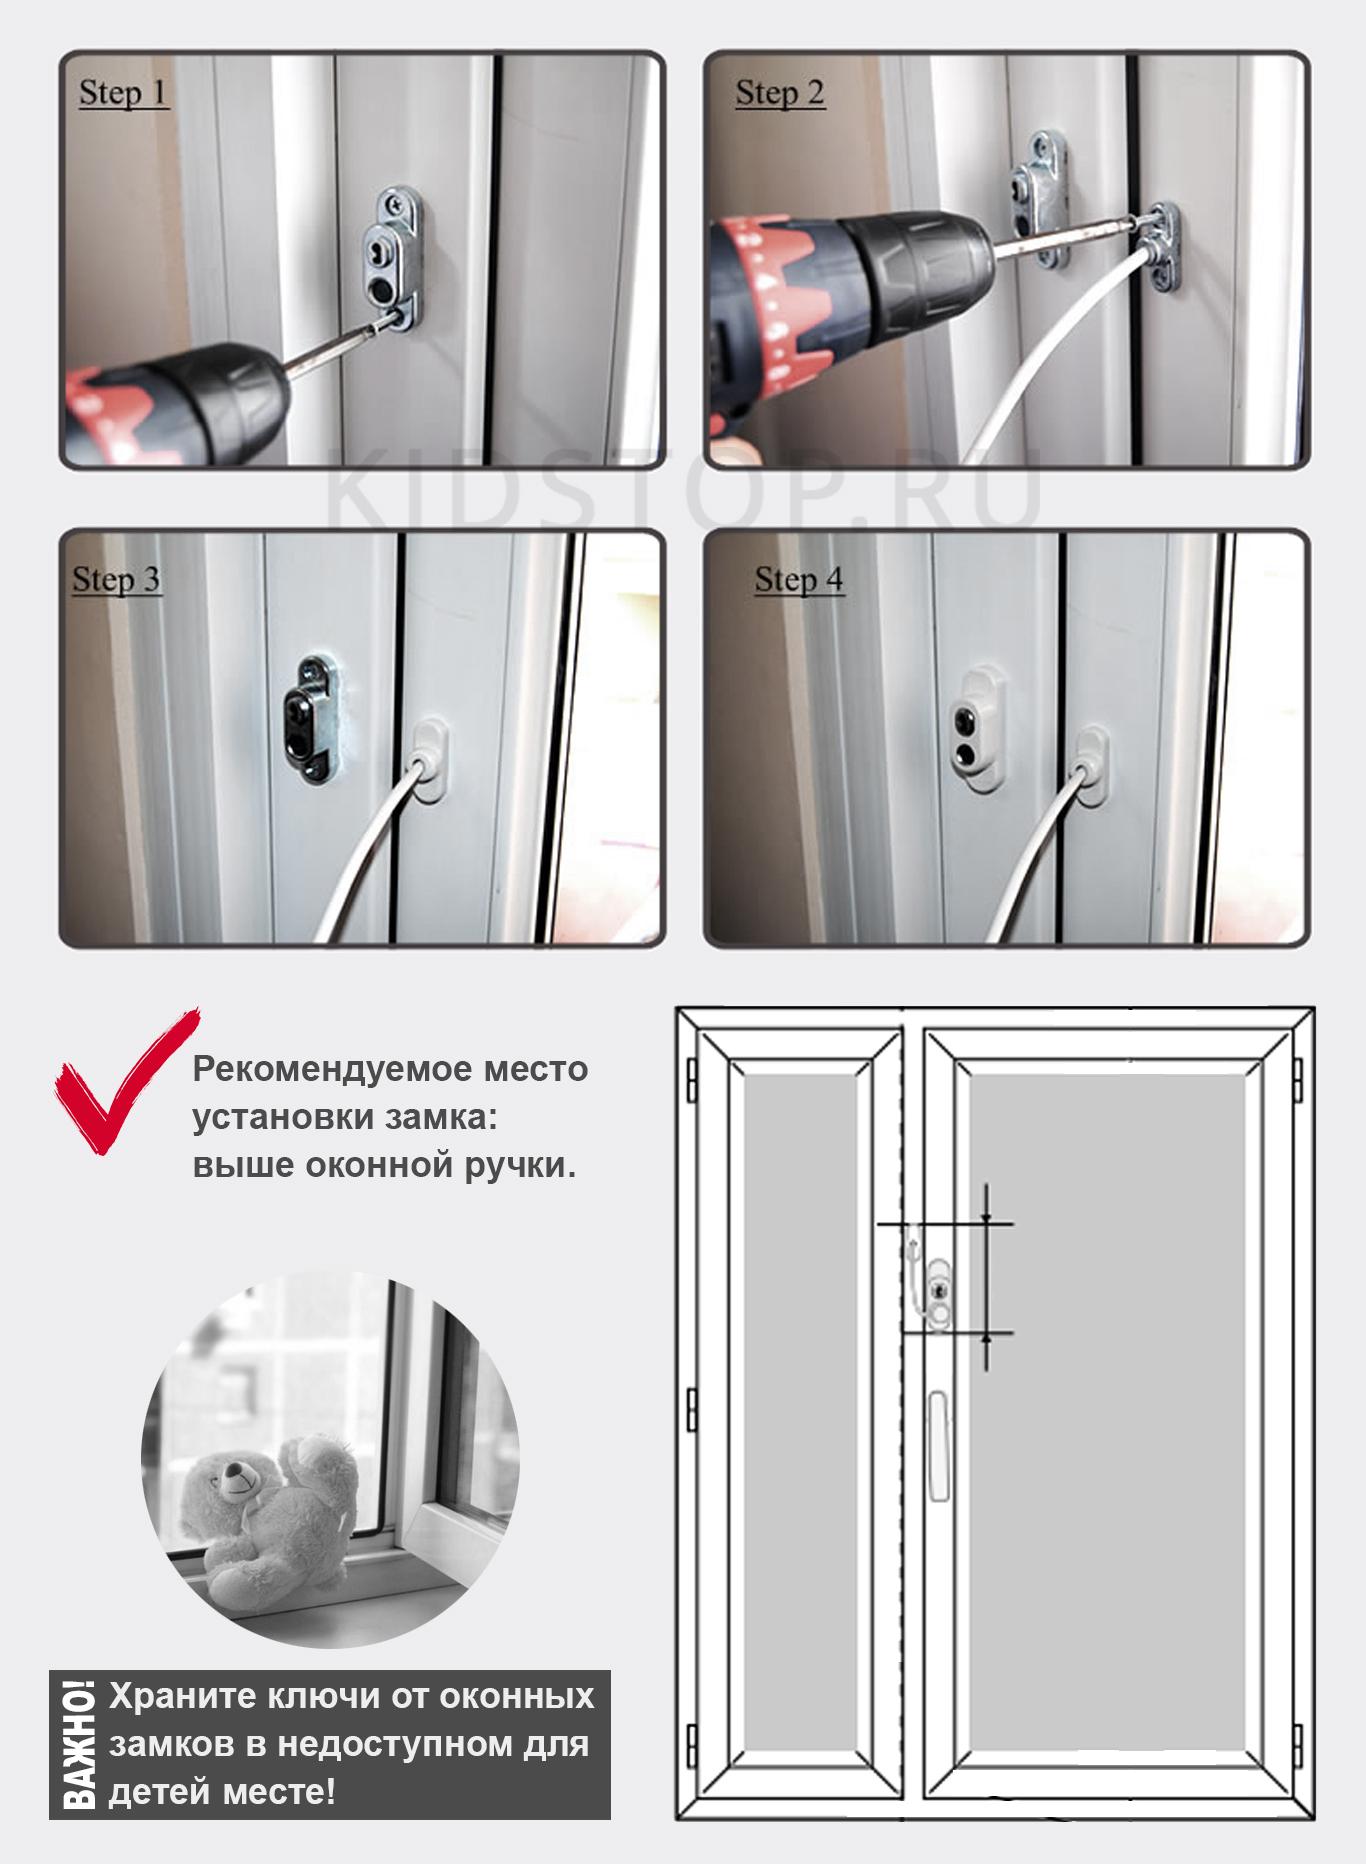 Penkid установка замка инструкция